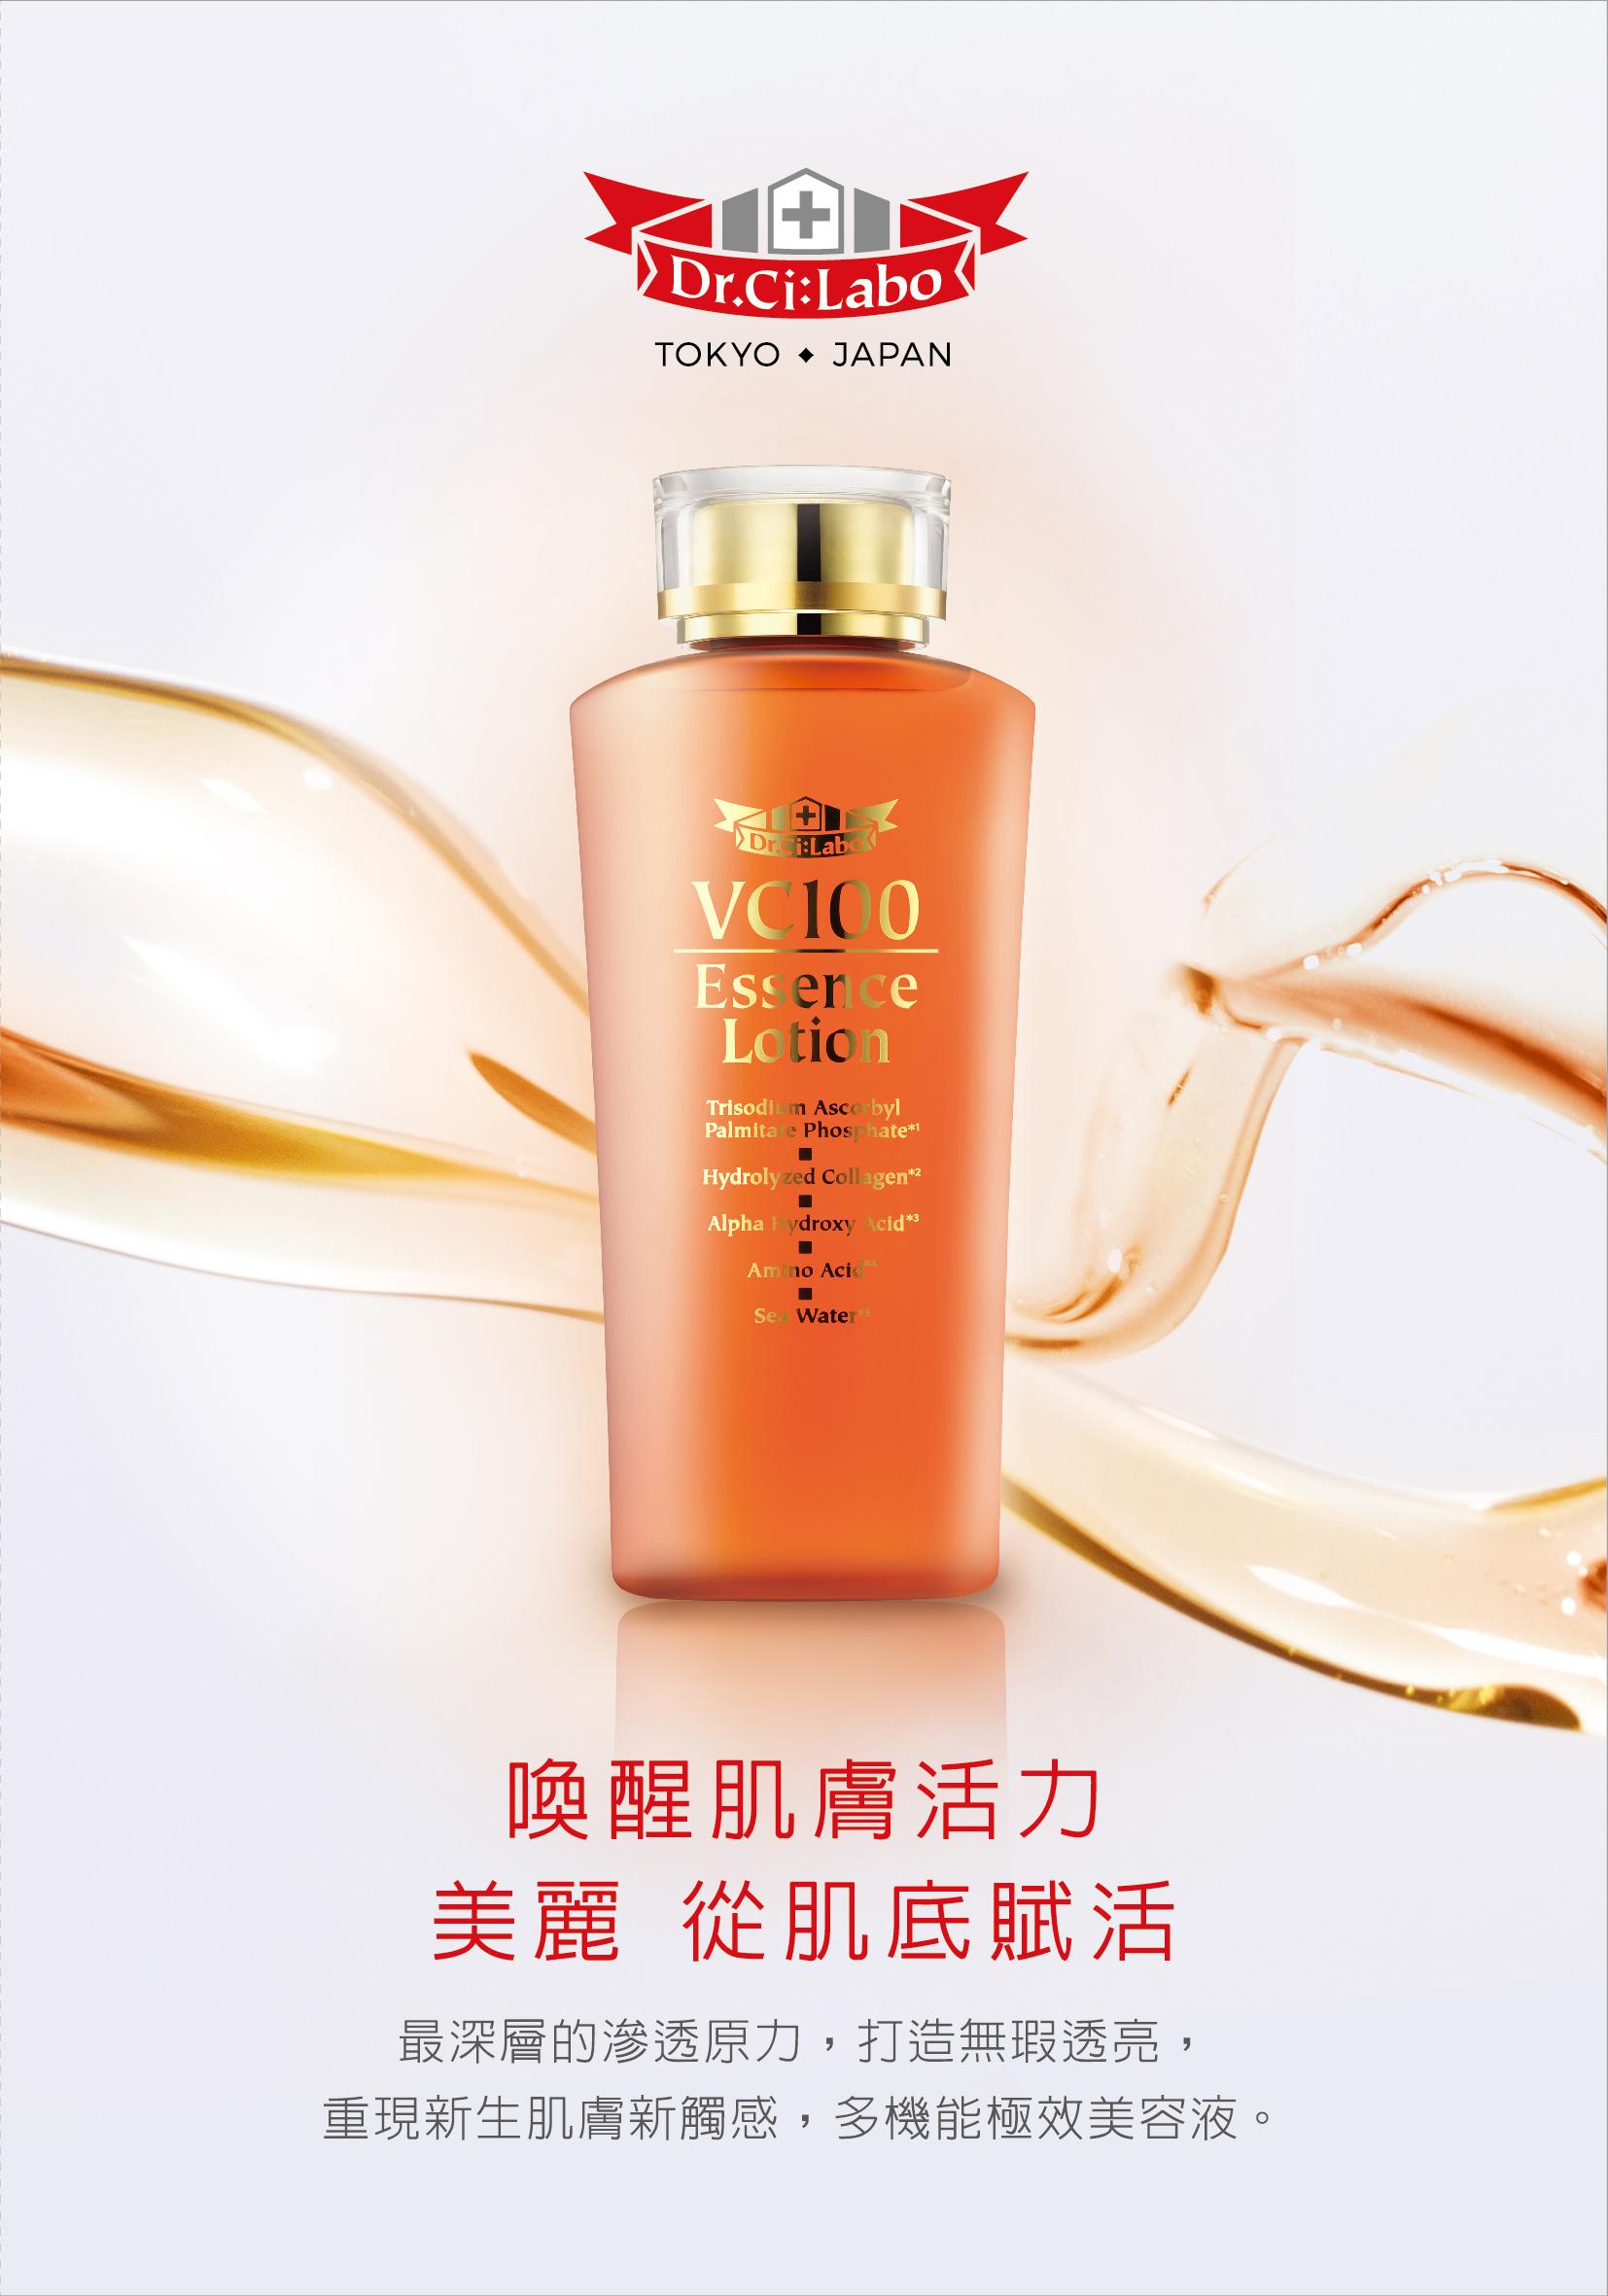 Dr.Ci:Labo, 超瞬間滲透美妍水EX, 小橘水, DrCiLabo哪裡買, 小橘水推薦, 毛孔問題, 肌膚問題, 縮小毛孔, 試用, 體驗